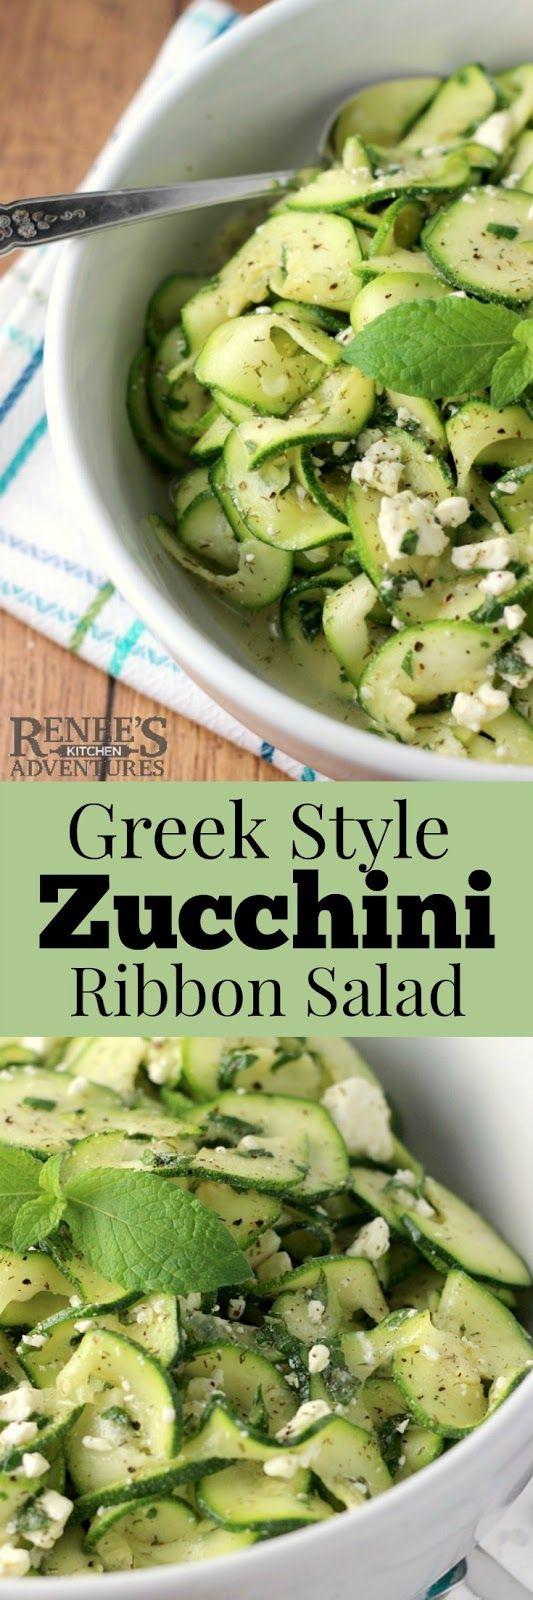 Greek Style Zucchini Ribbon Salad